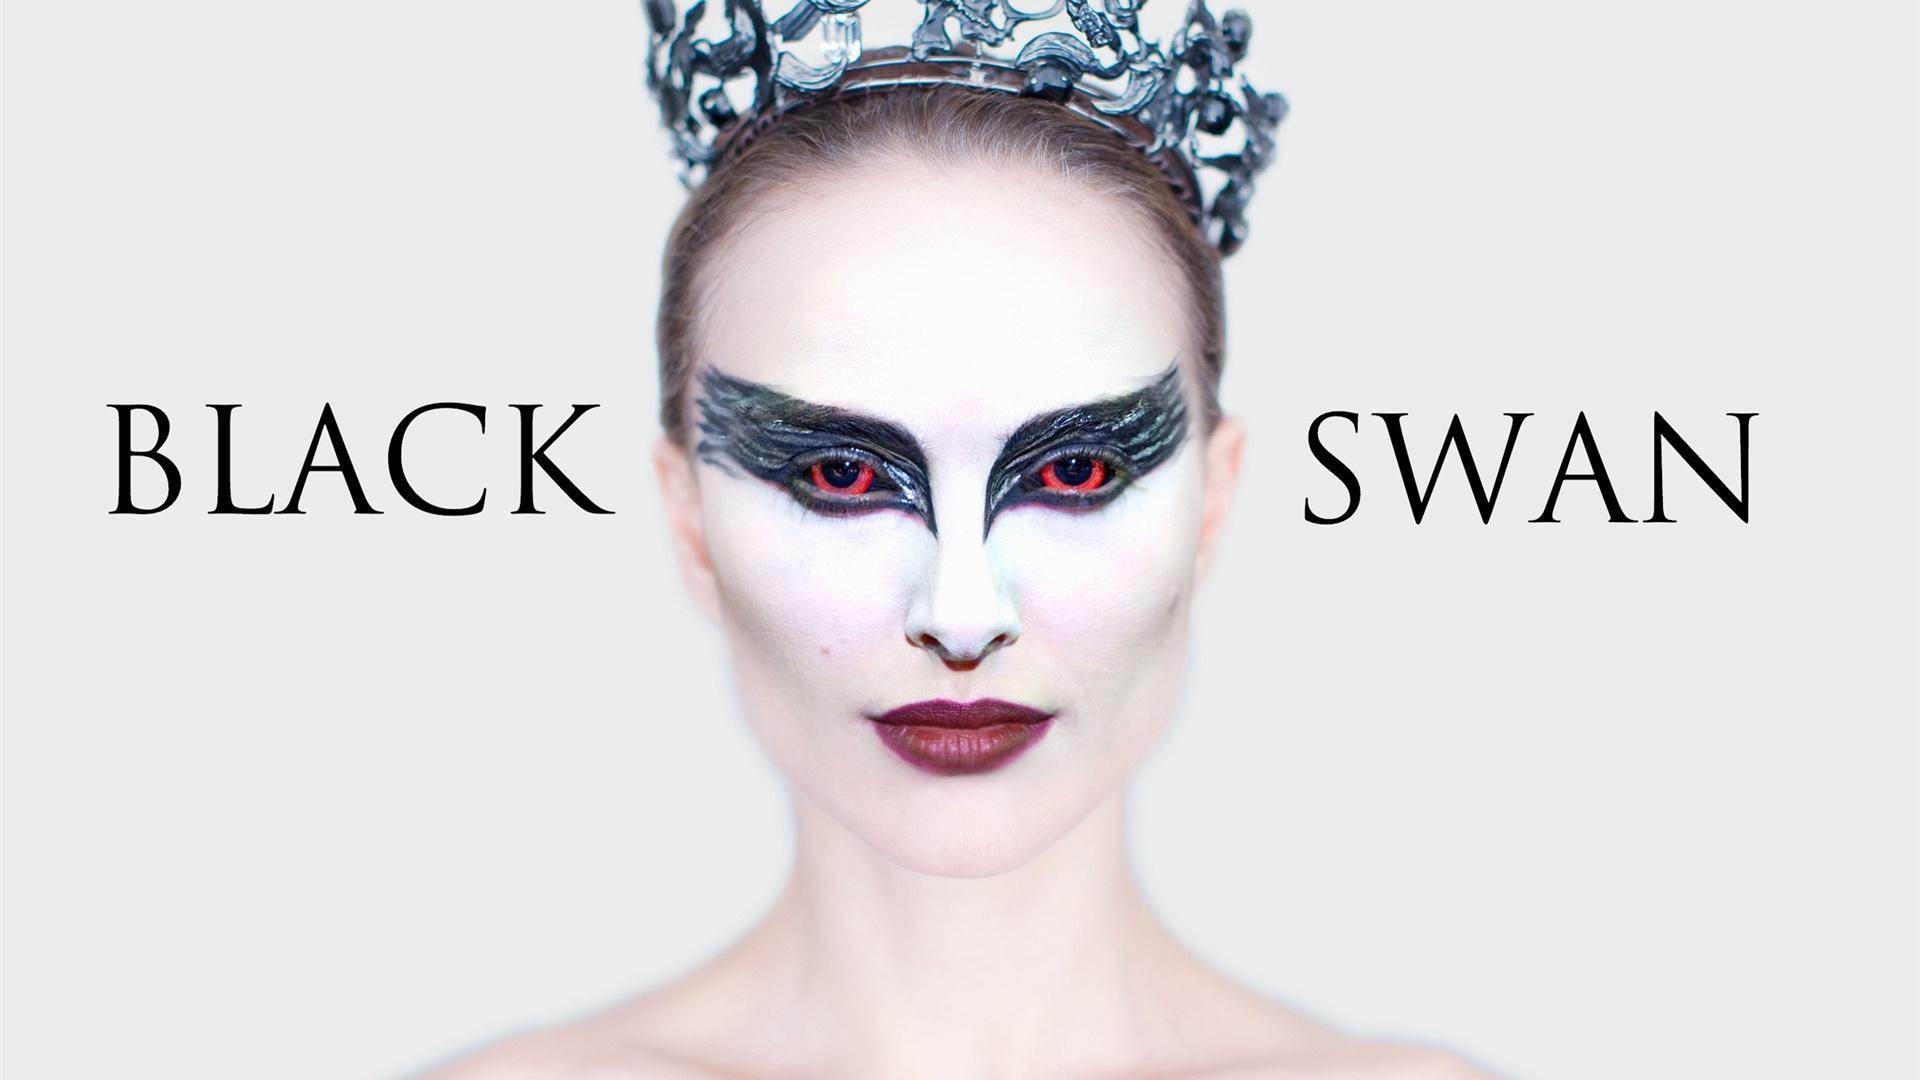 Black Swan - A fekete hattyú (2010)